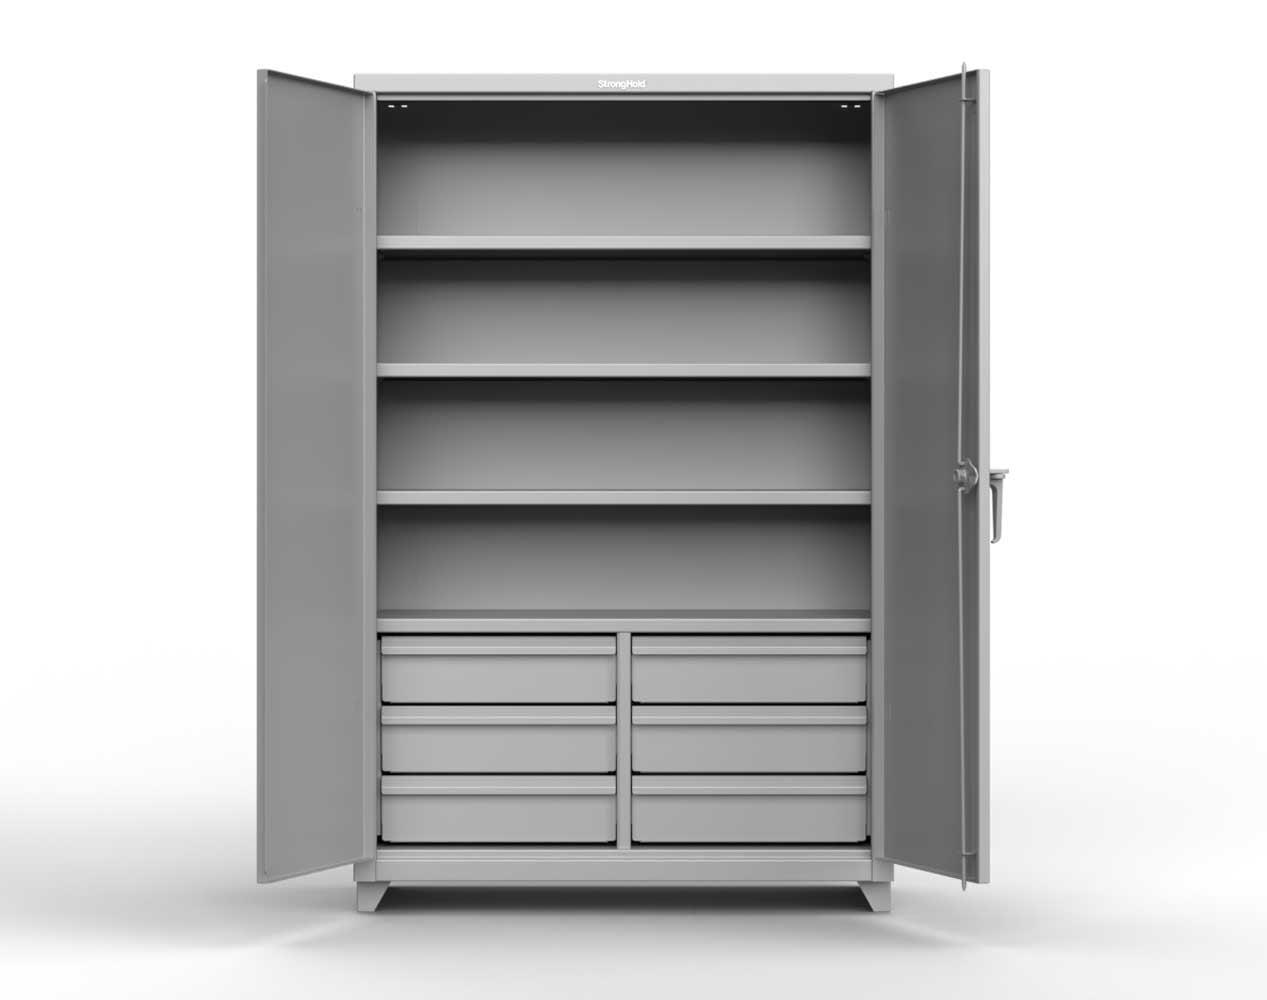 Heavy Duty 14 GA Cabinet with 6 Half-Width Drawers, 4 Shelves – 48 In. W x 24 In. D x 75 In. H